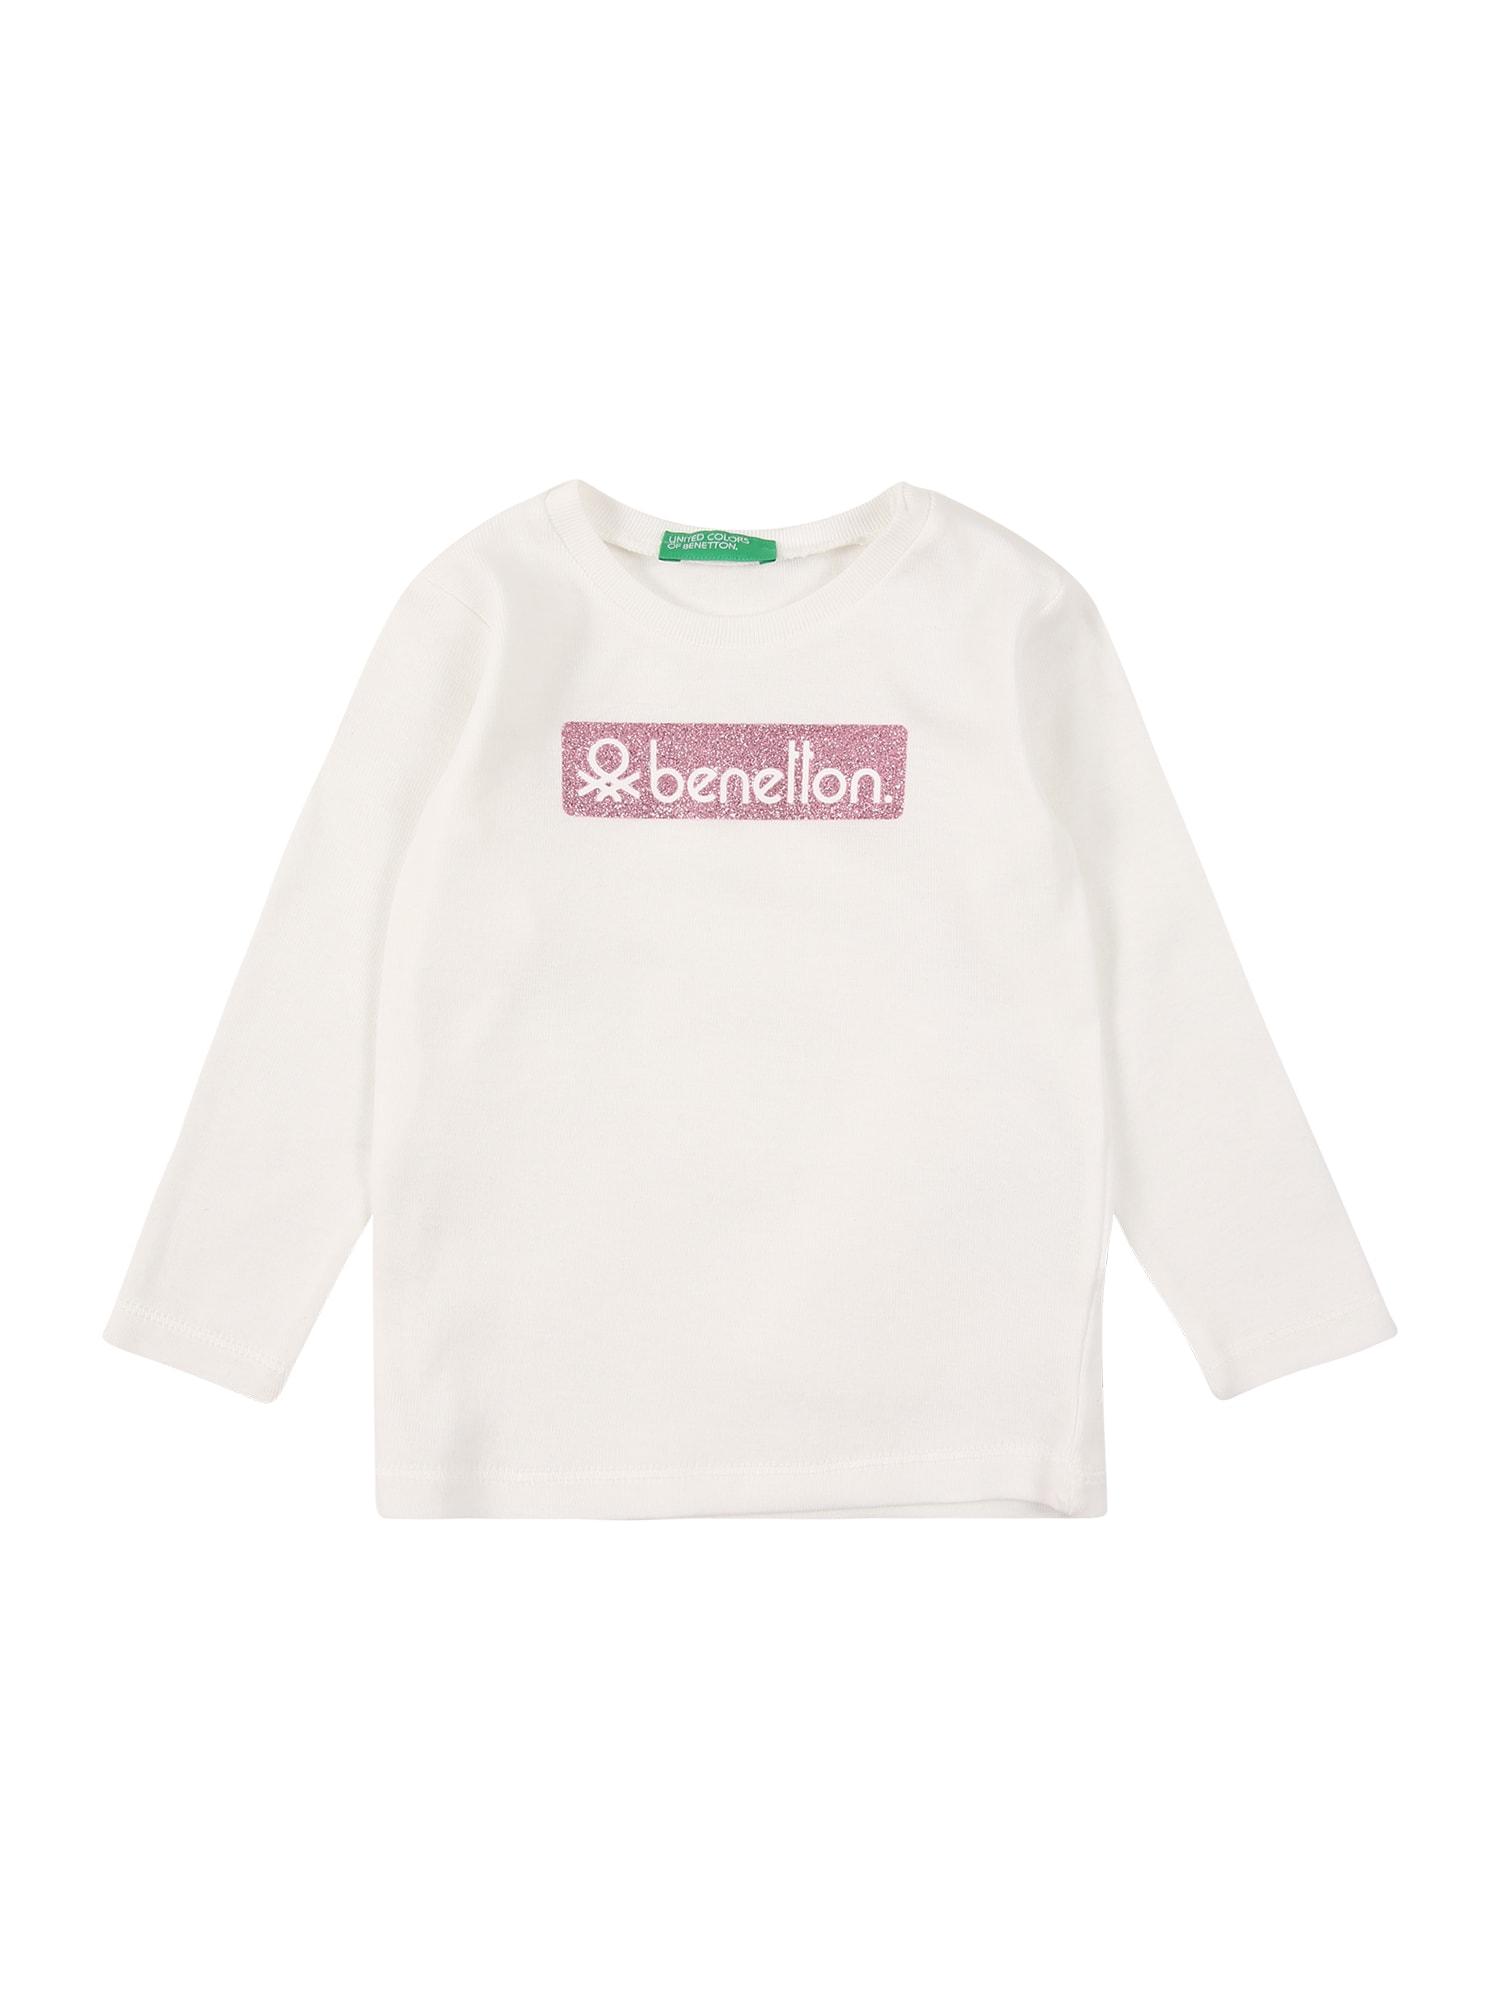 UNITED COLORS OF BENETTON Tričko  bílá / pink